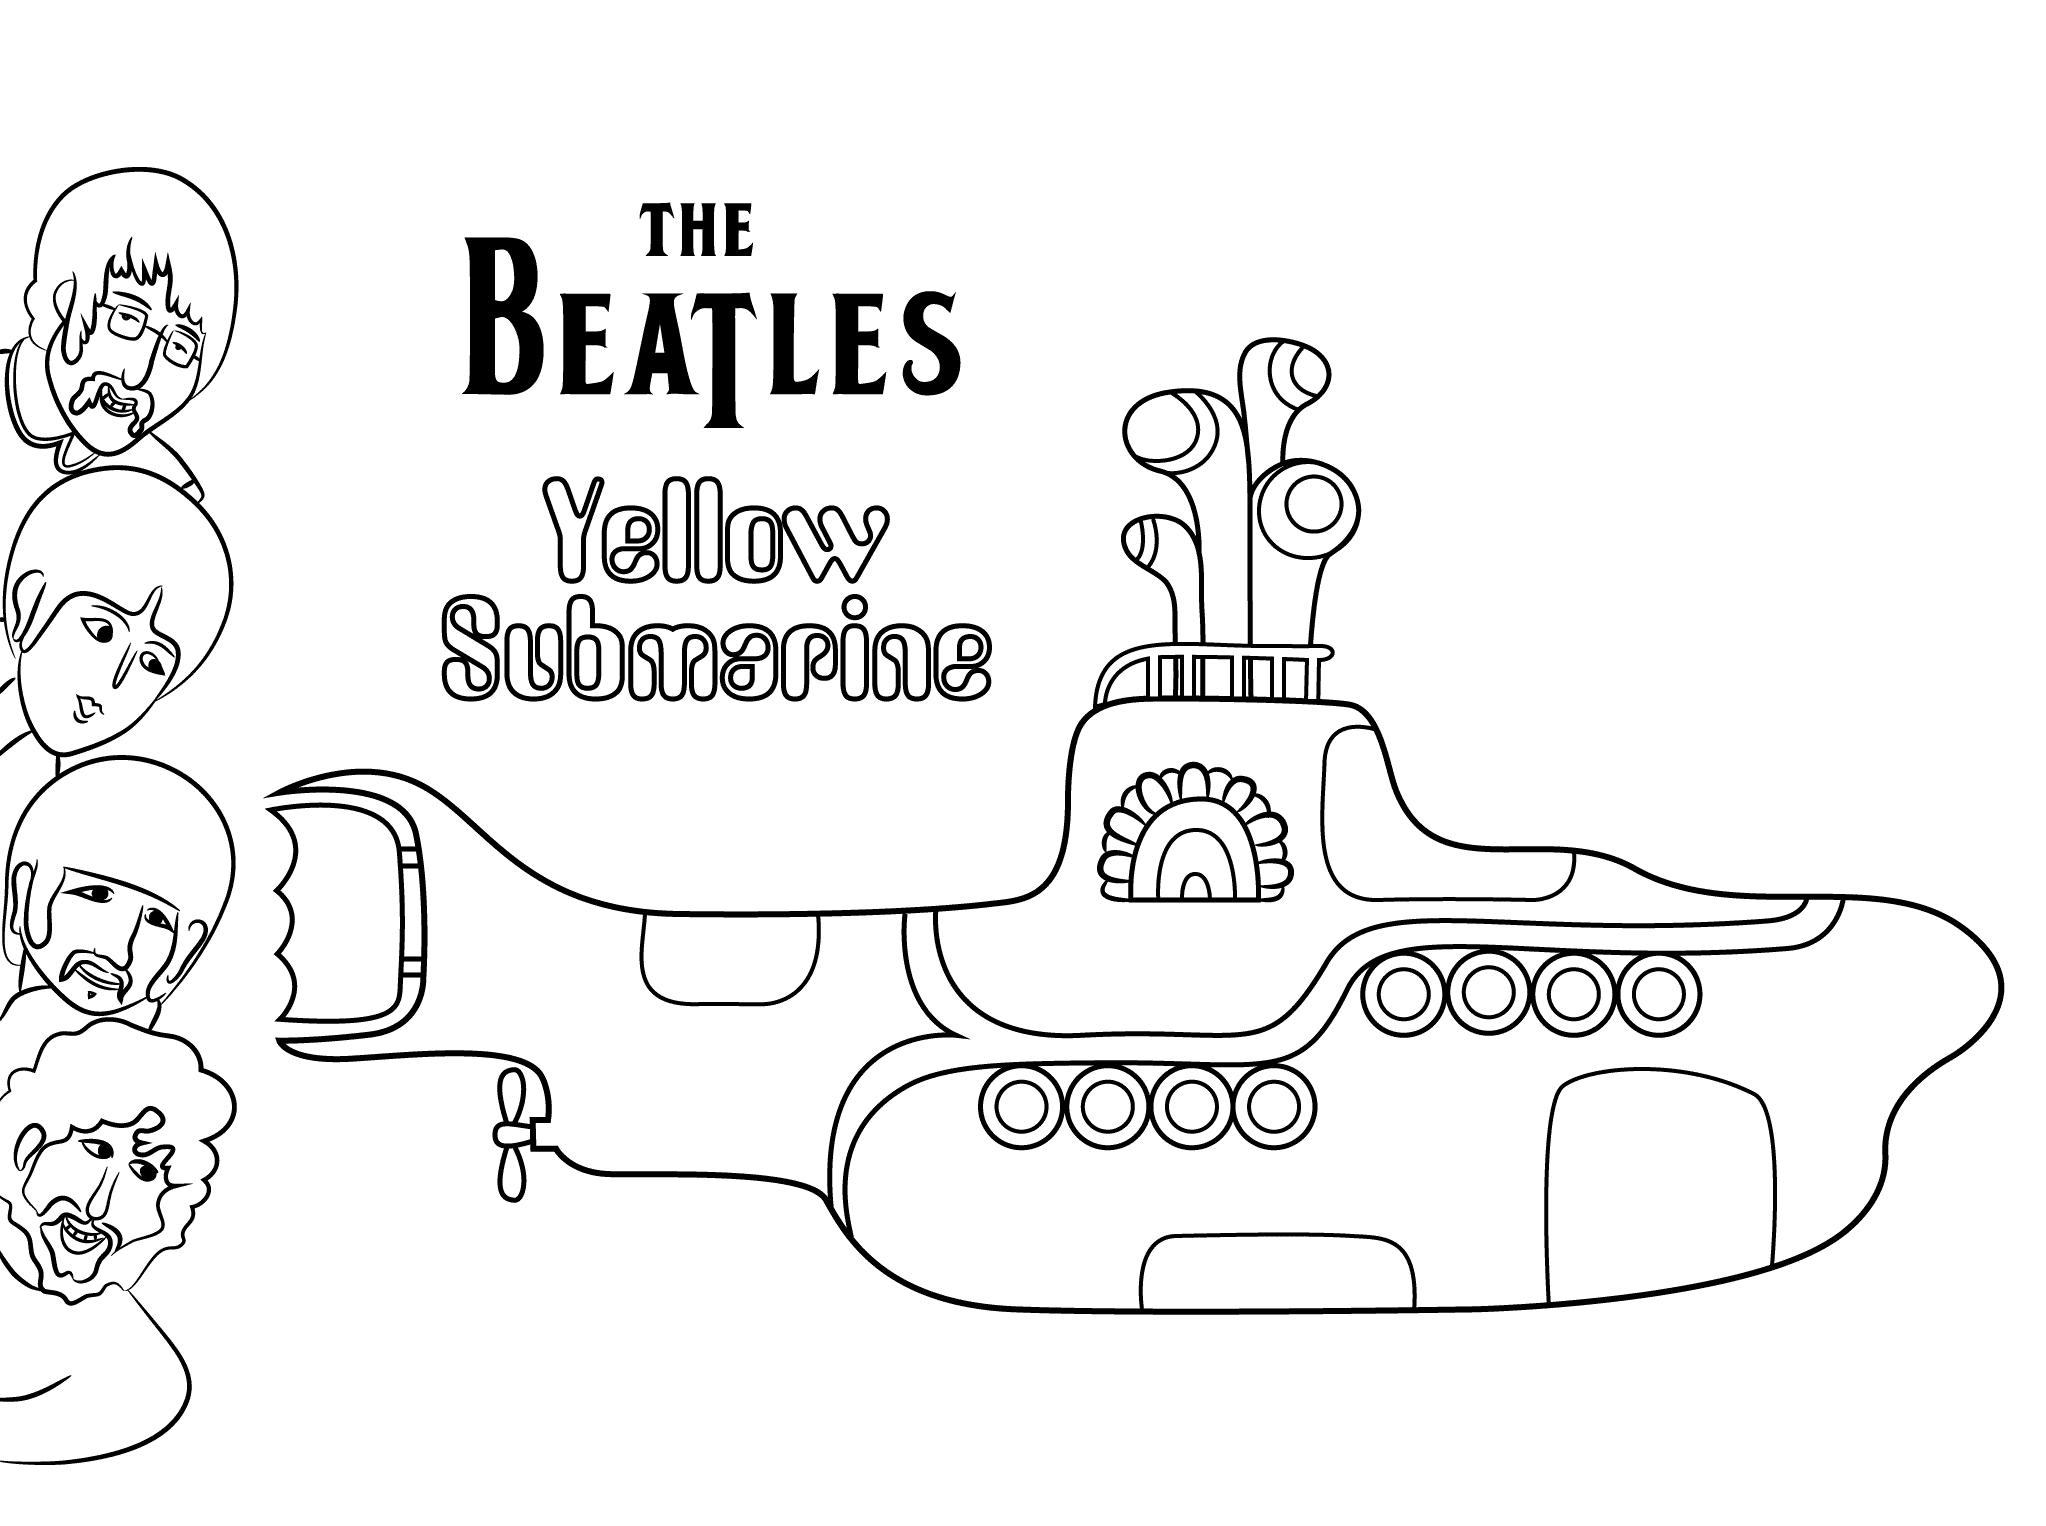 The beatles yellow submarine   idéias viajadas   Pinterest